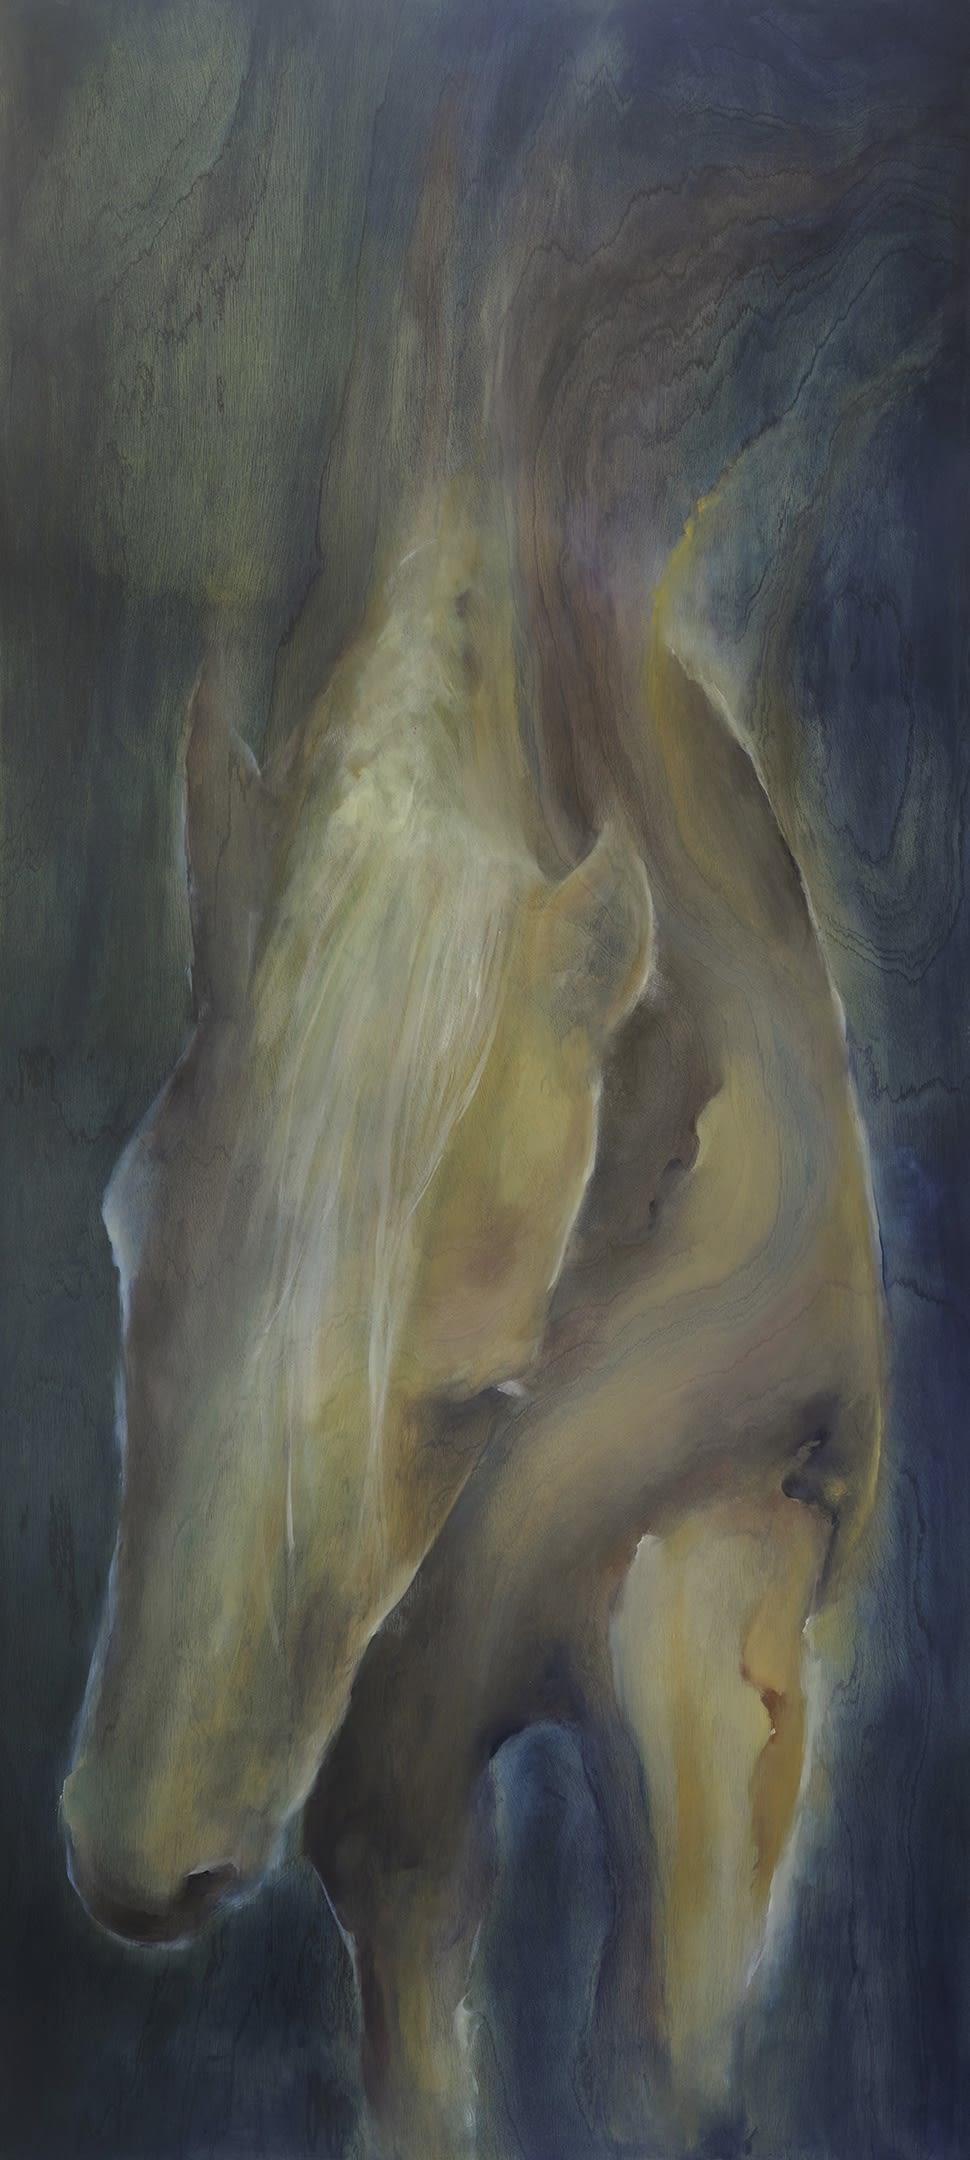 "Nicholas Baldridge 'Strength' Oil on Wood, 34 x 80"" 2019"